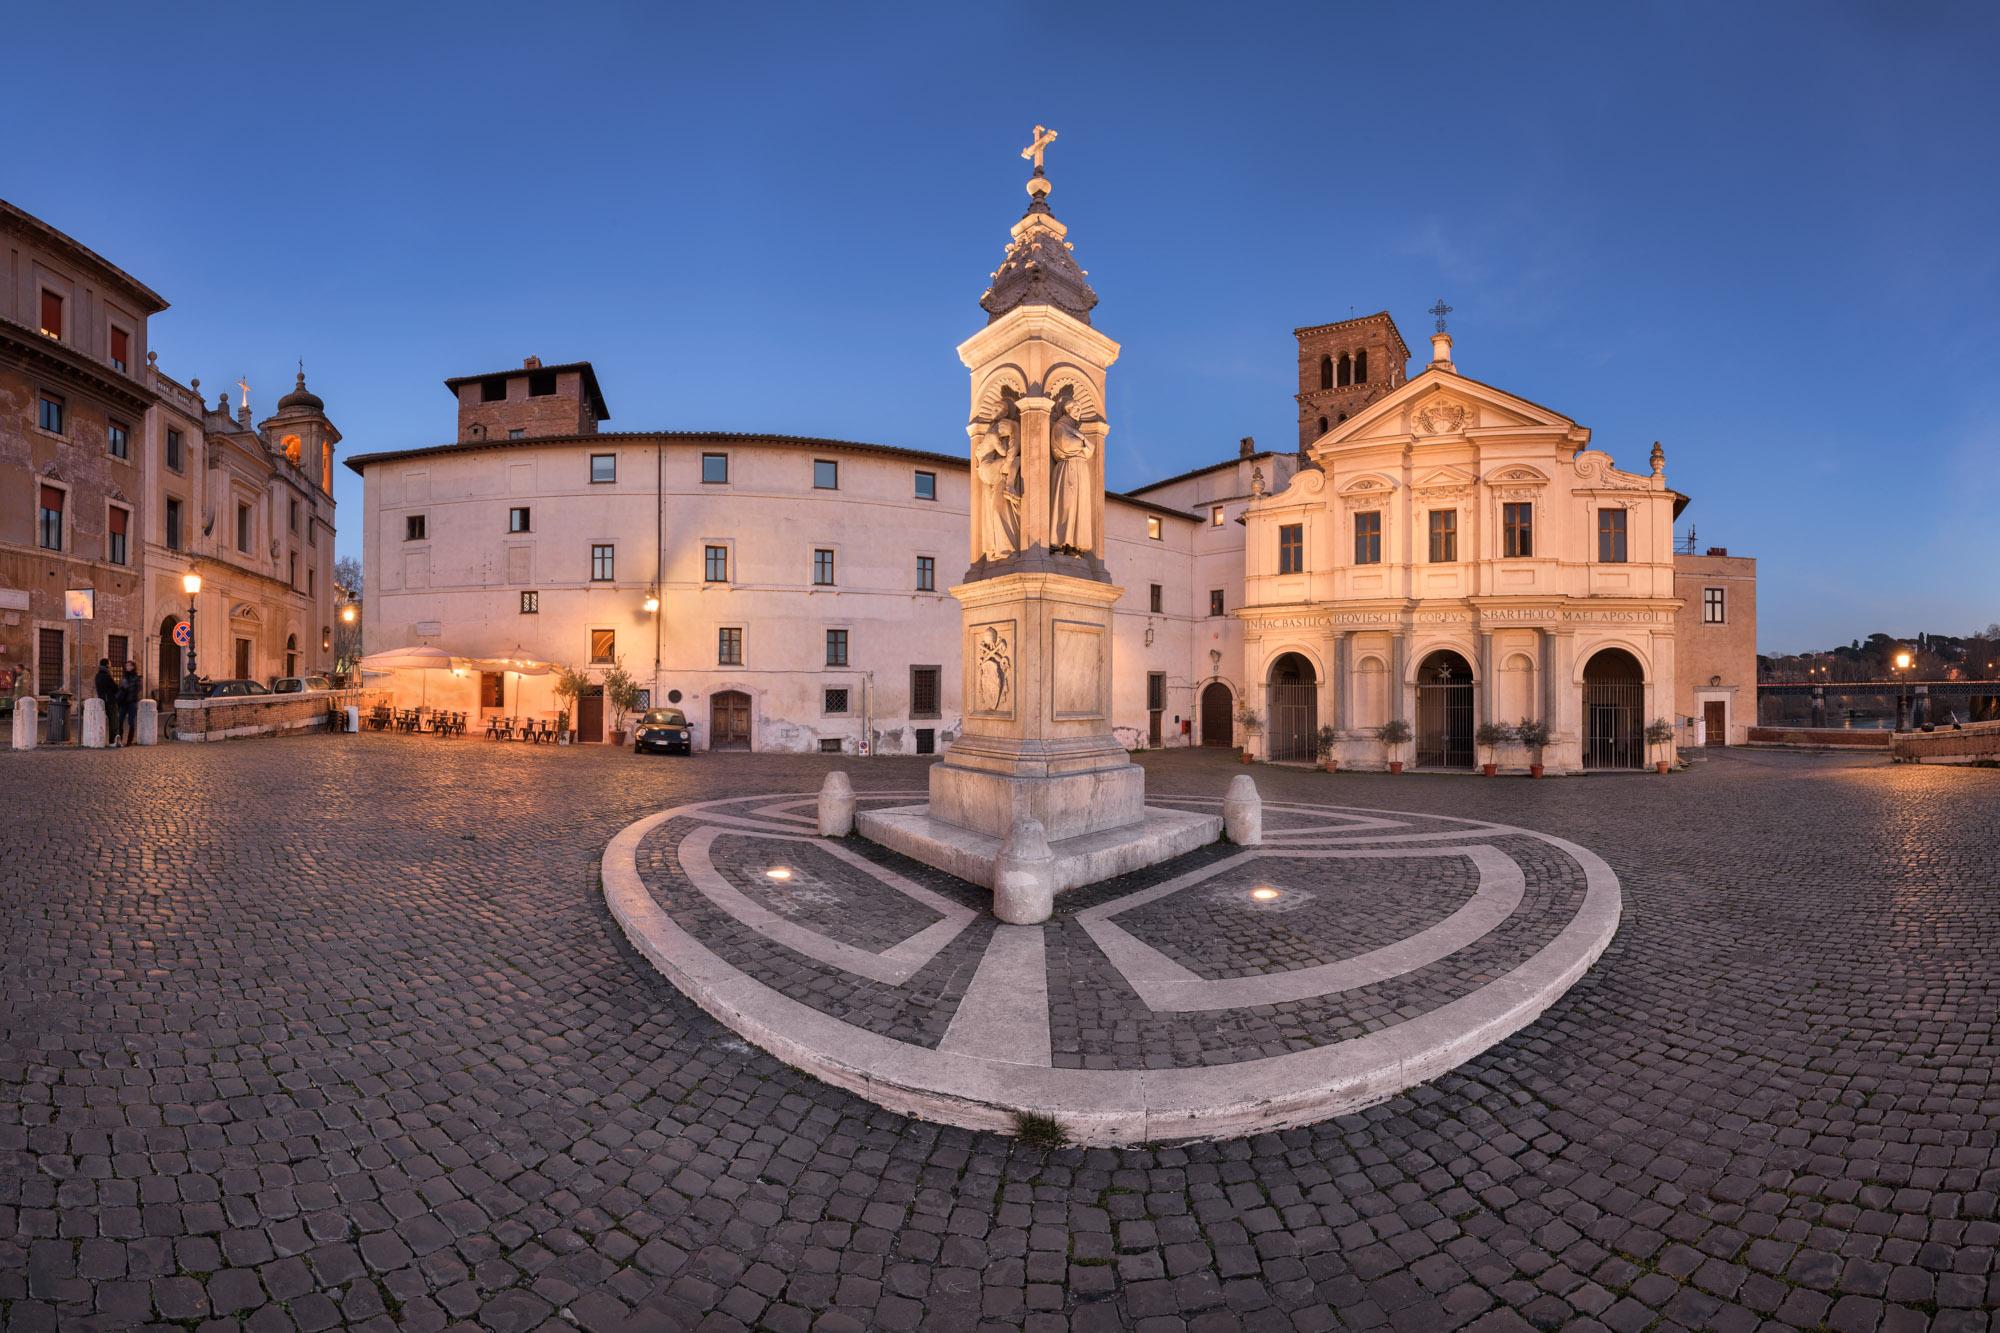 Piazza San Bartolomeo and Column of Pius IX, Rome, Italy